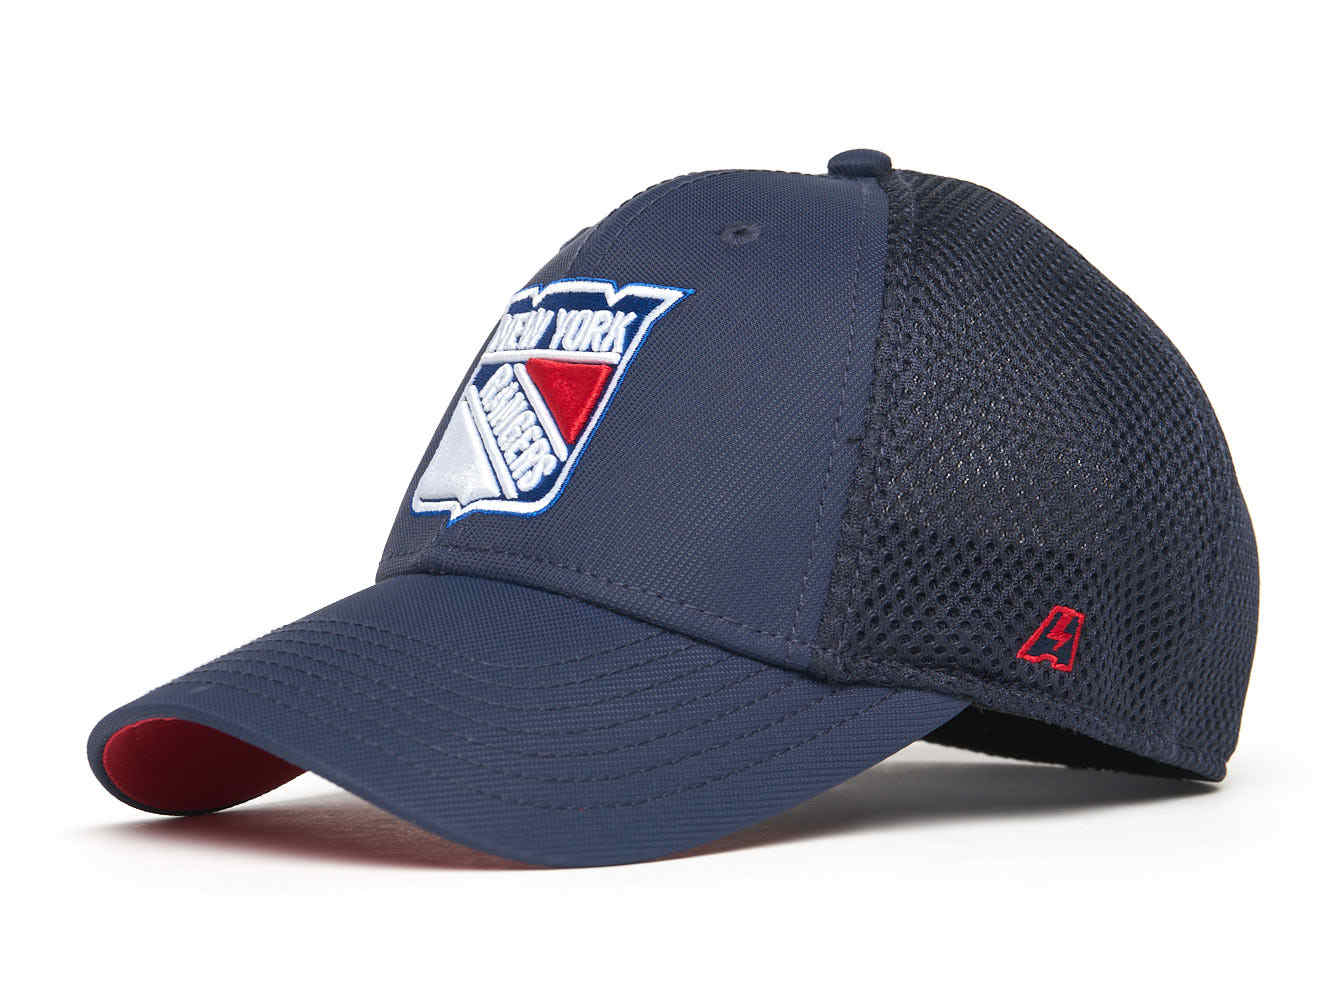 Бейсболка NHL New York Rangers (размер M/L)